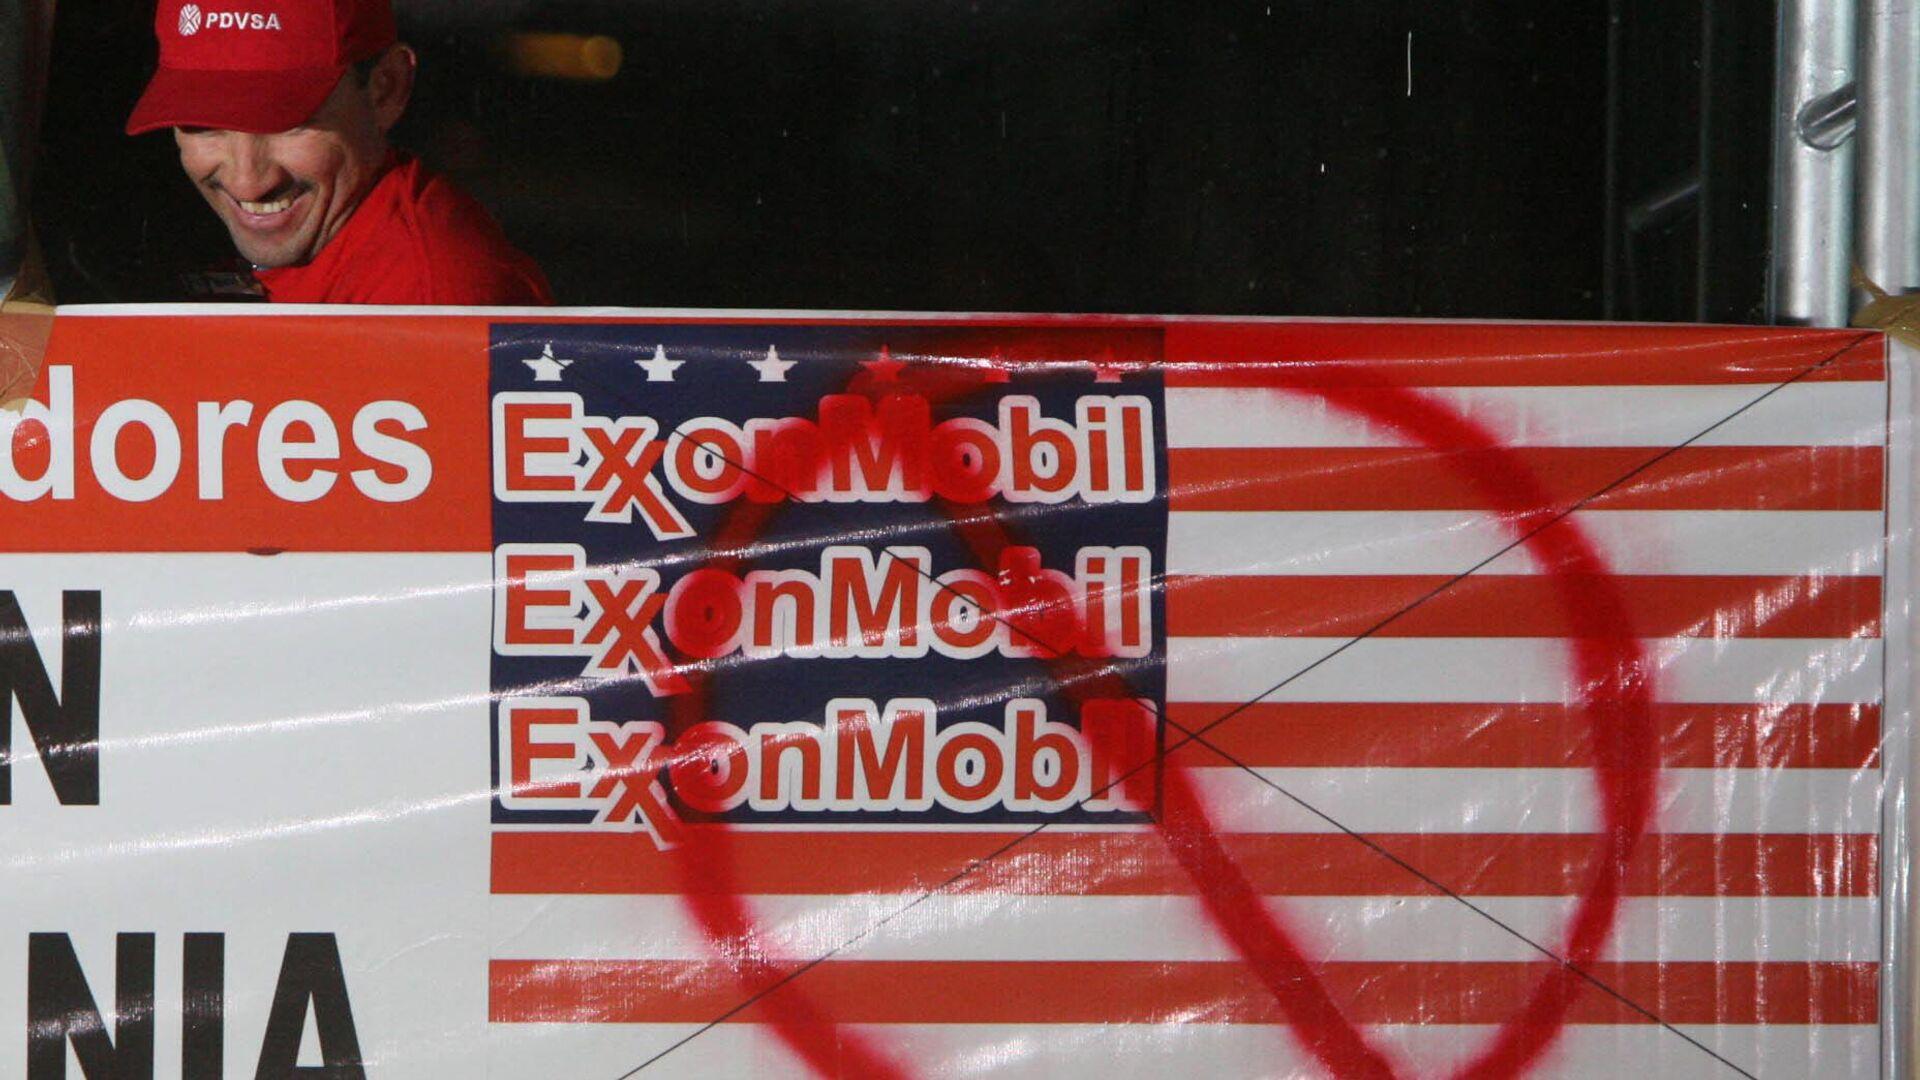 Protesta contra Exxon Mobil en Venezuela - Sputnik Mundo, 1920, 02.03.2021